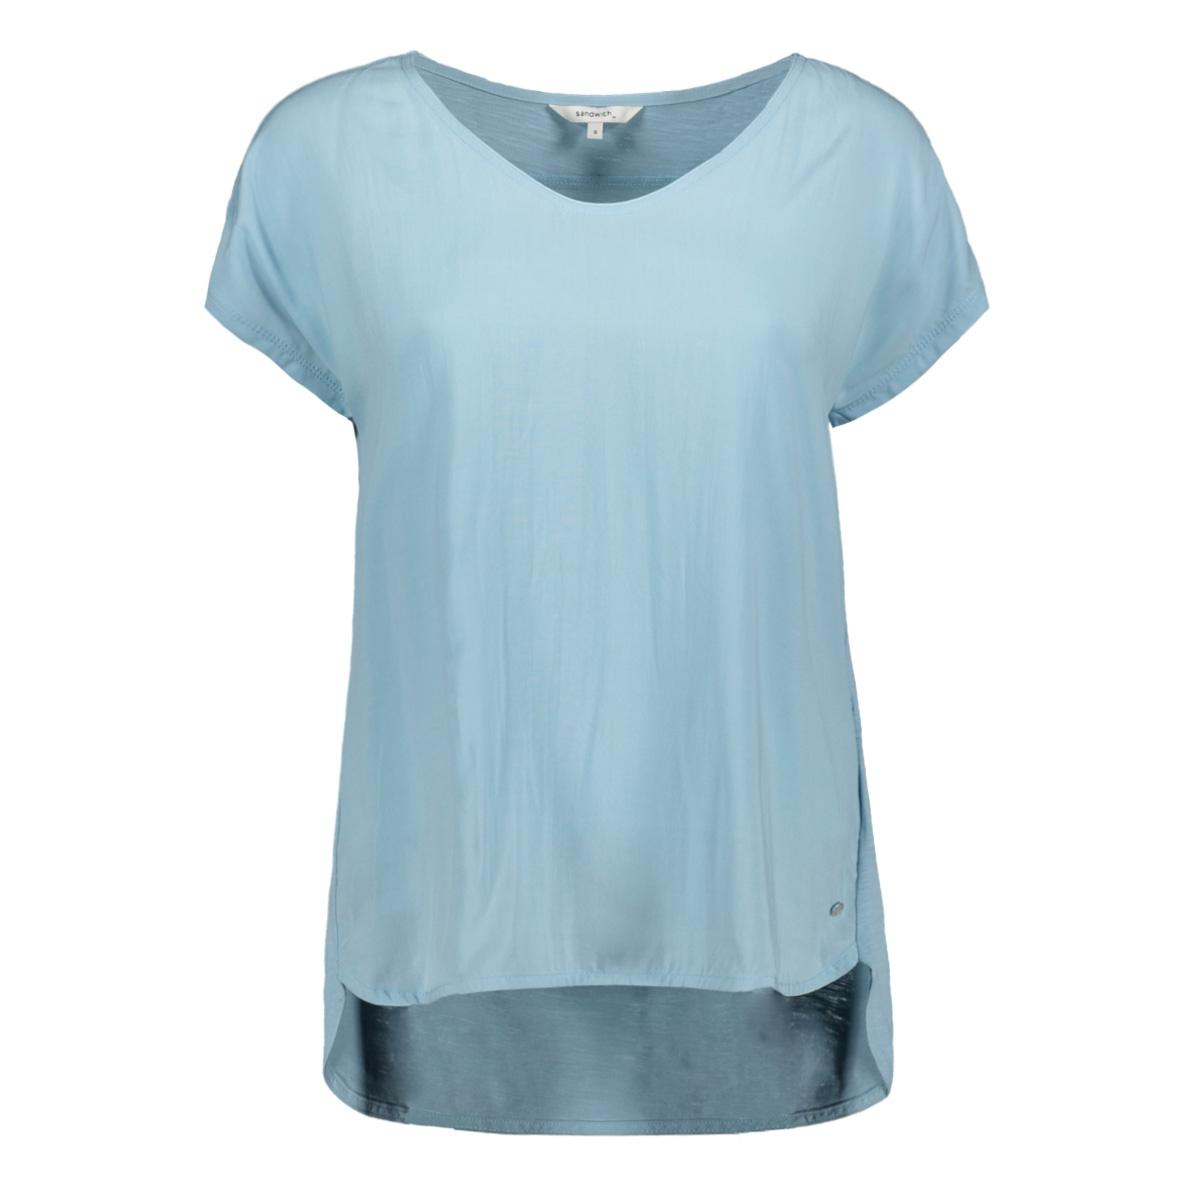 tshirt met v hals 21101704 sandwich t-shirt 41010